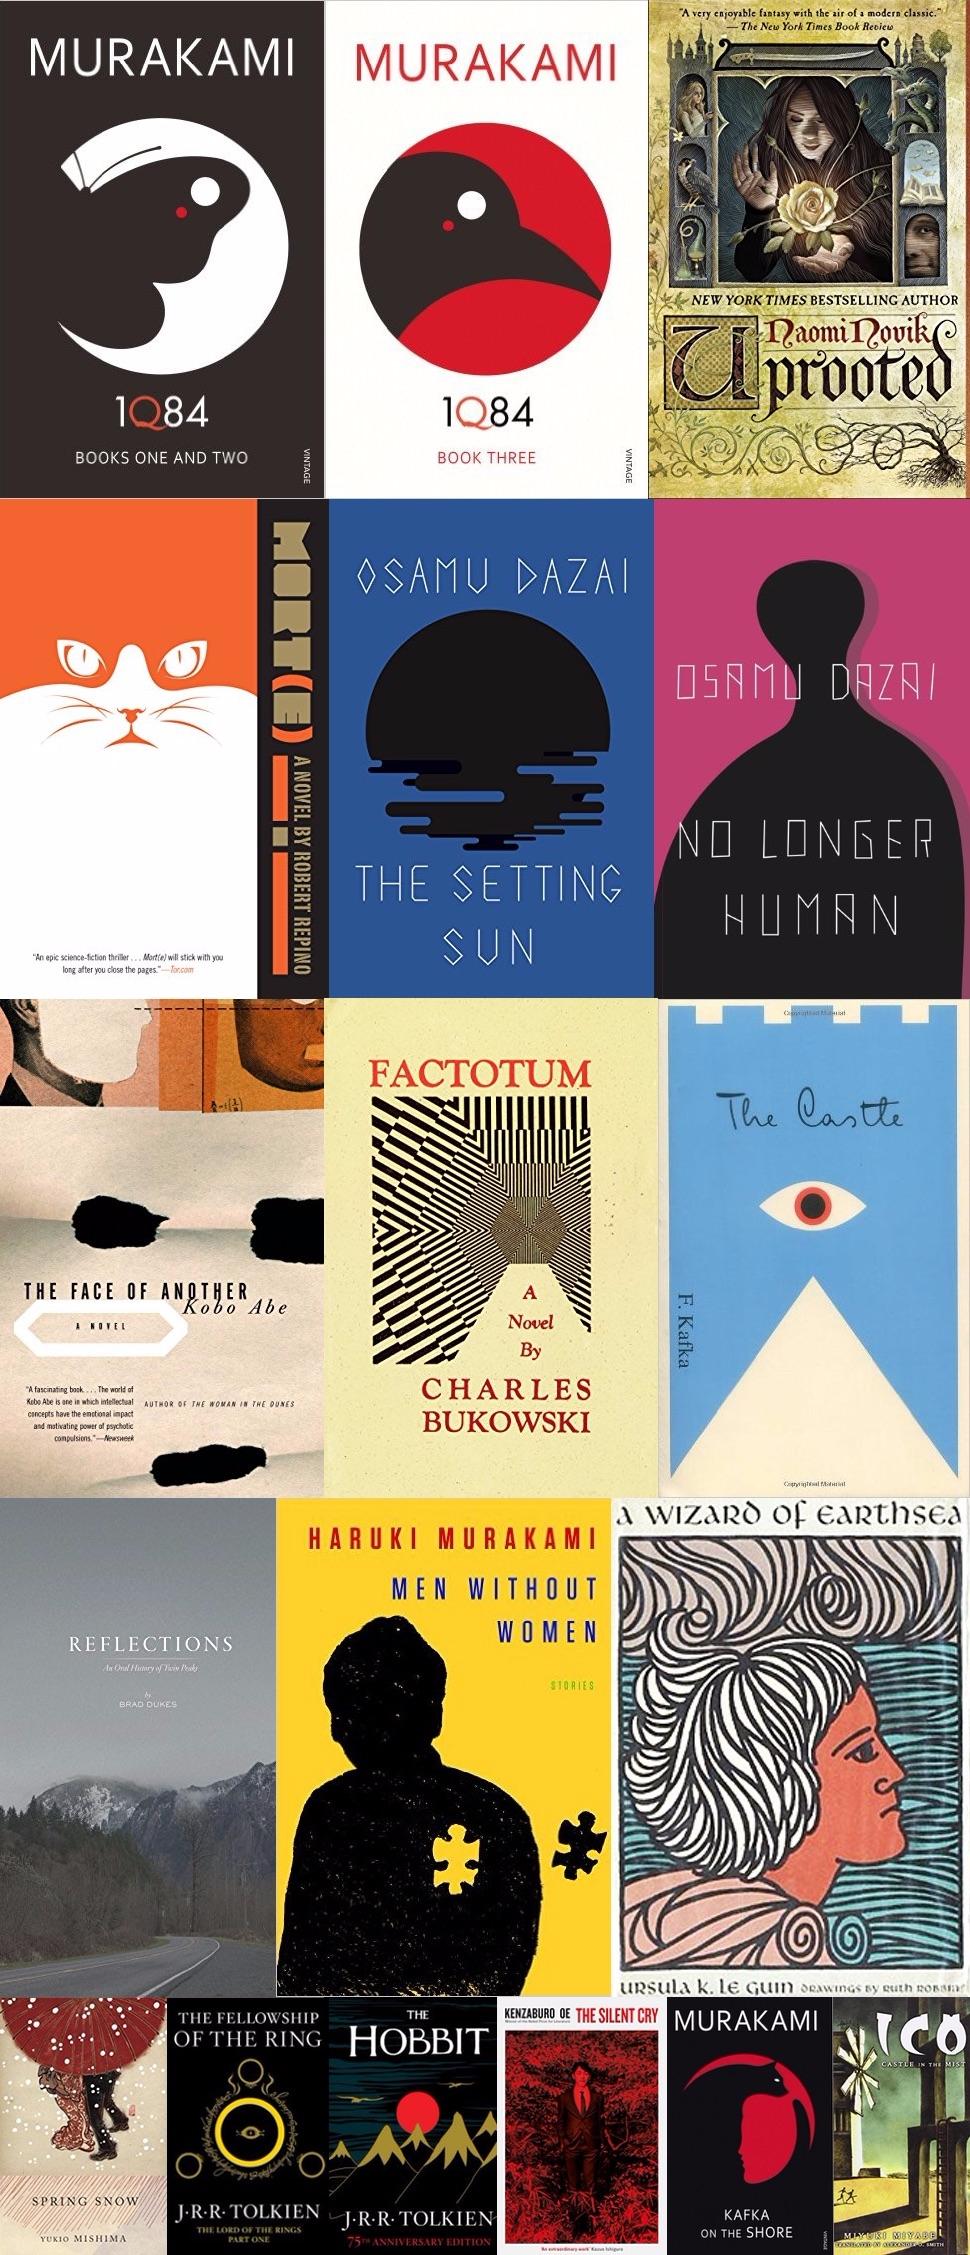 exploring analyzing book covers - brettchalupa | ello